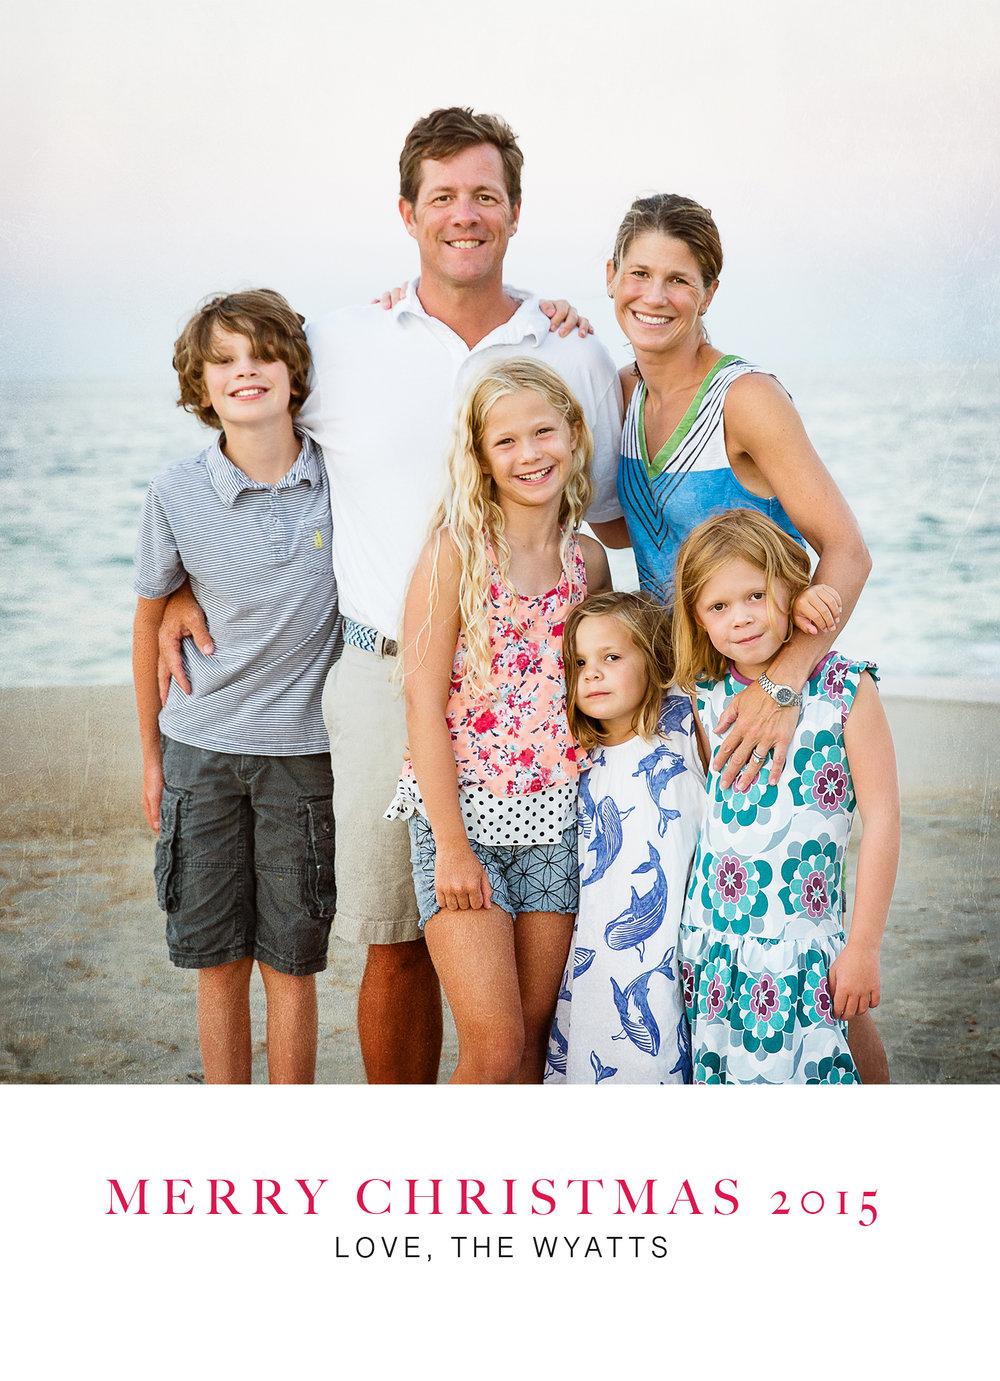 wyatt family card 2015 front.jpg